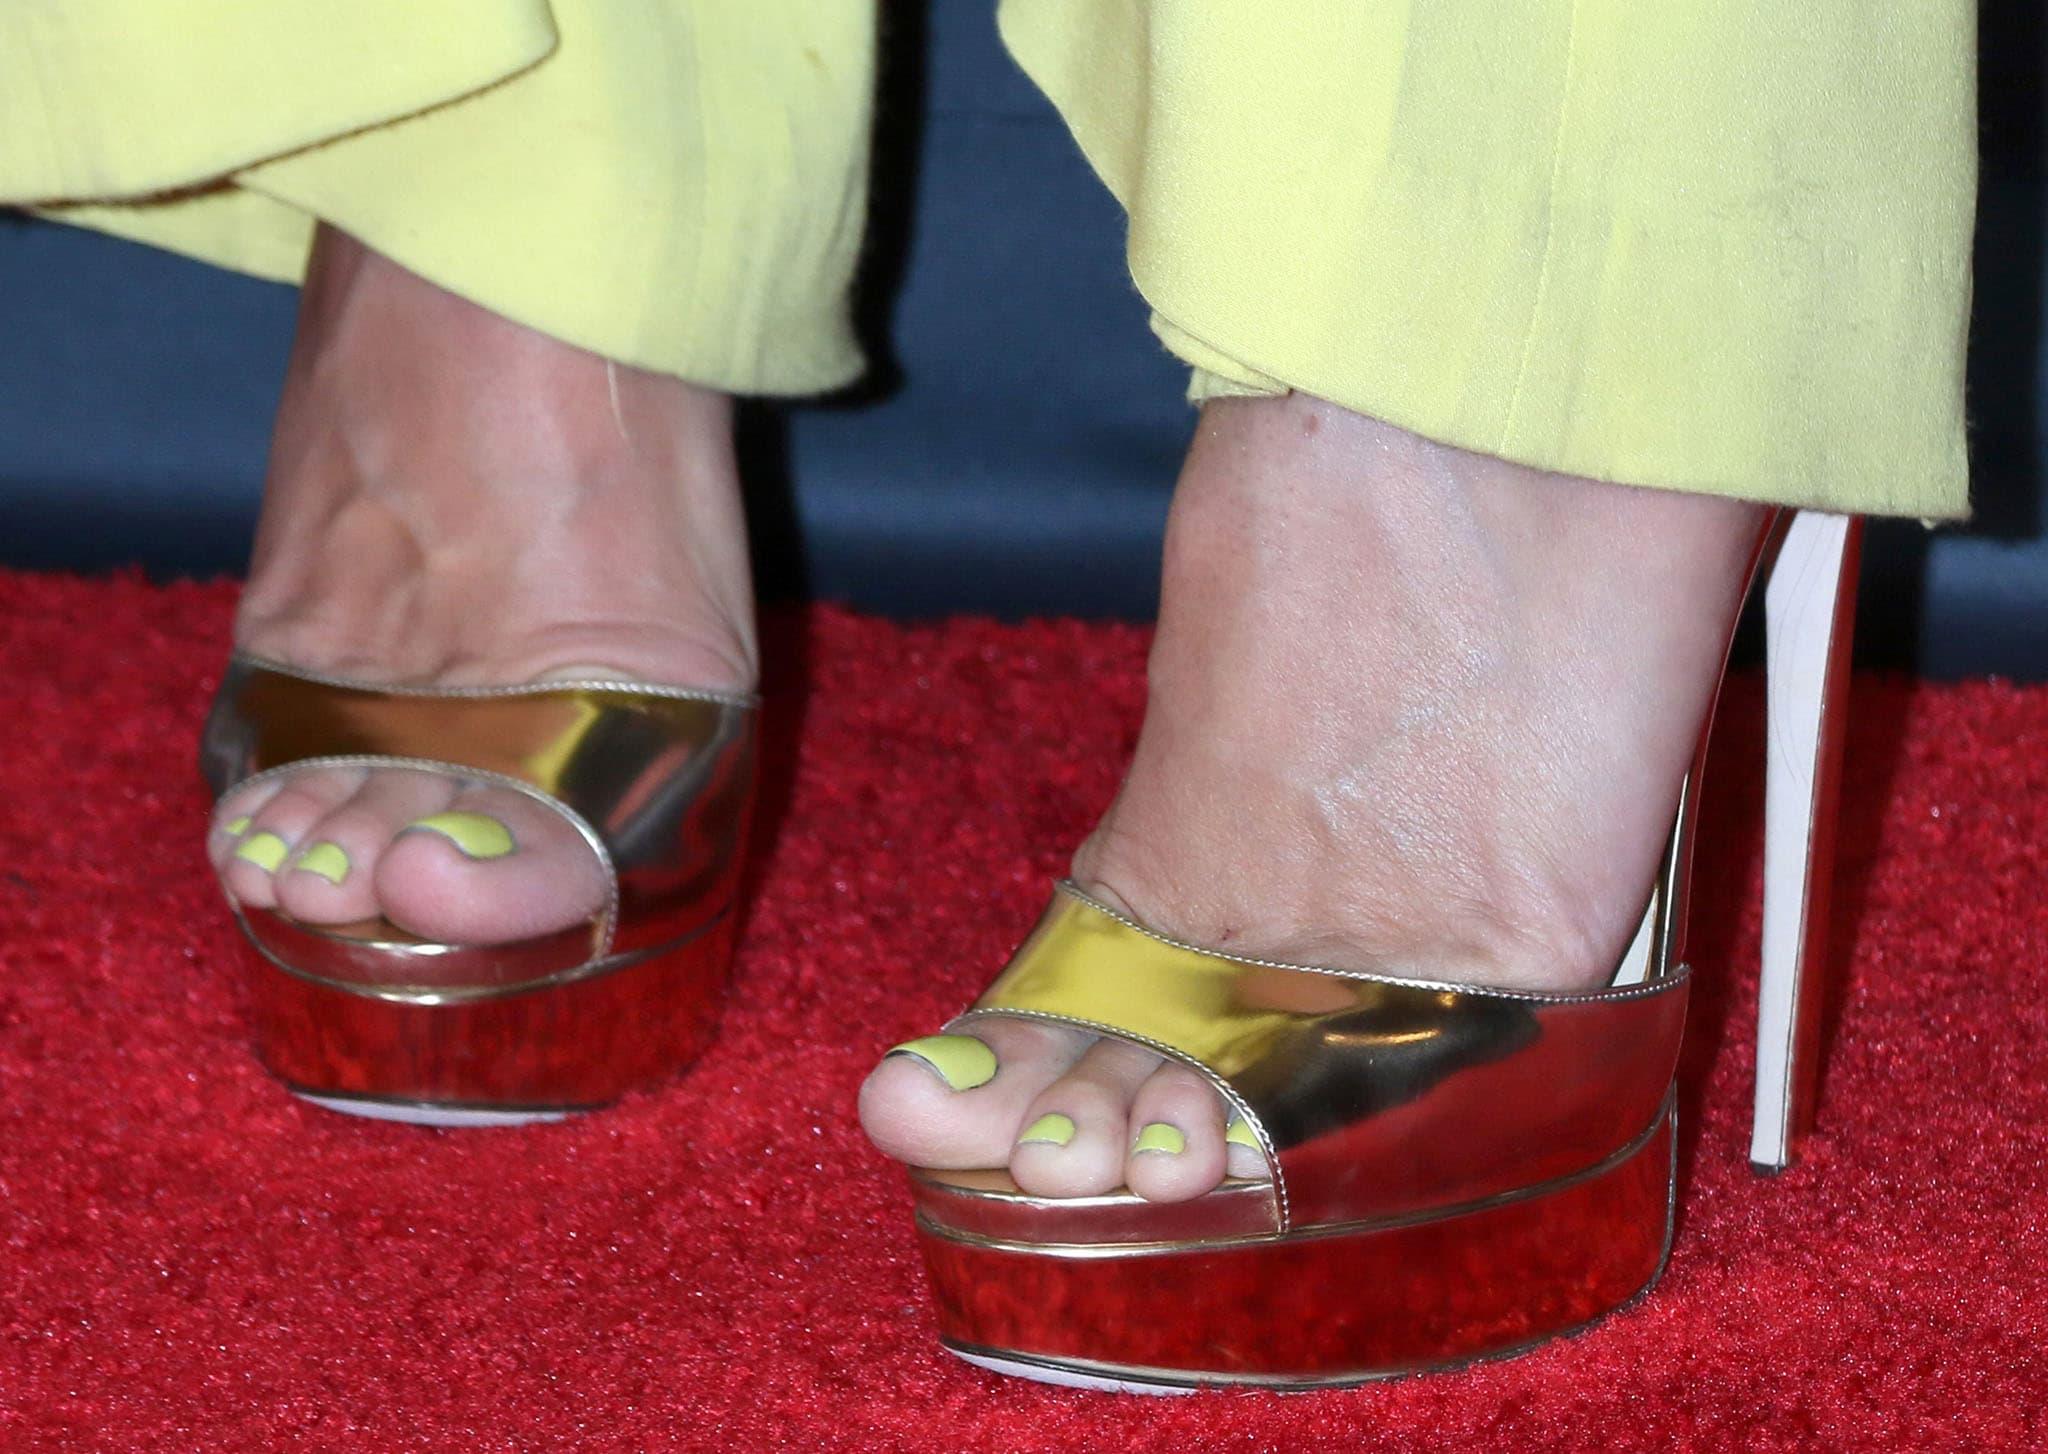 Heidi Klum displays her yellow pedicure in her mirror metallic gold platform sandals